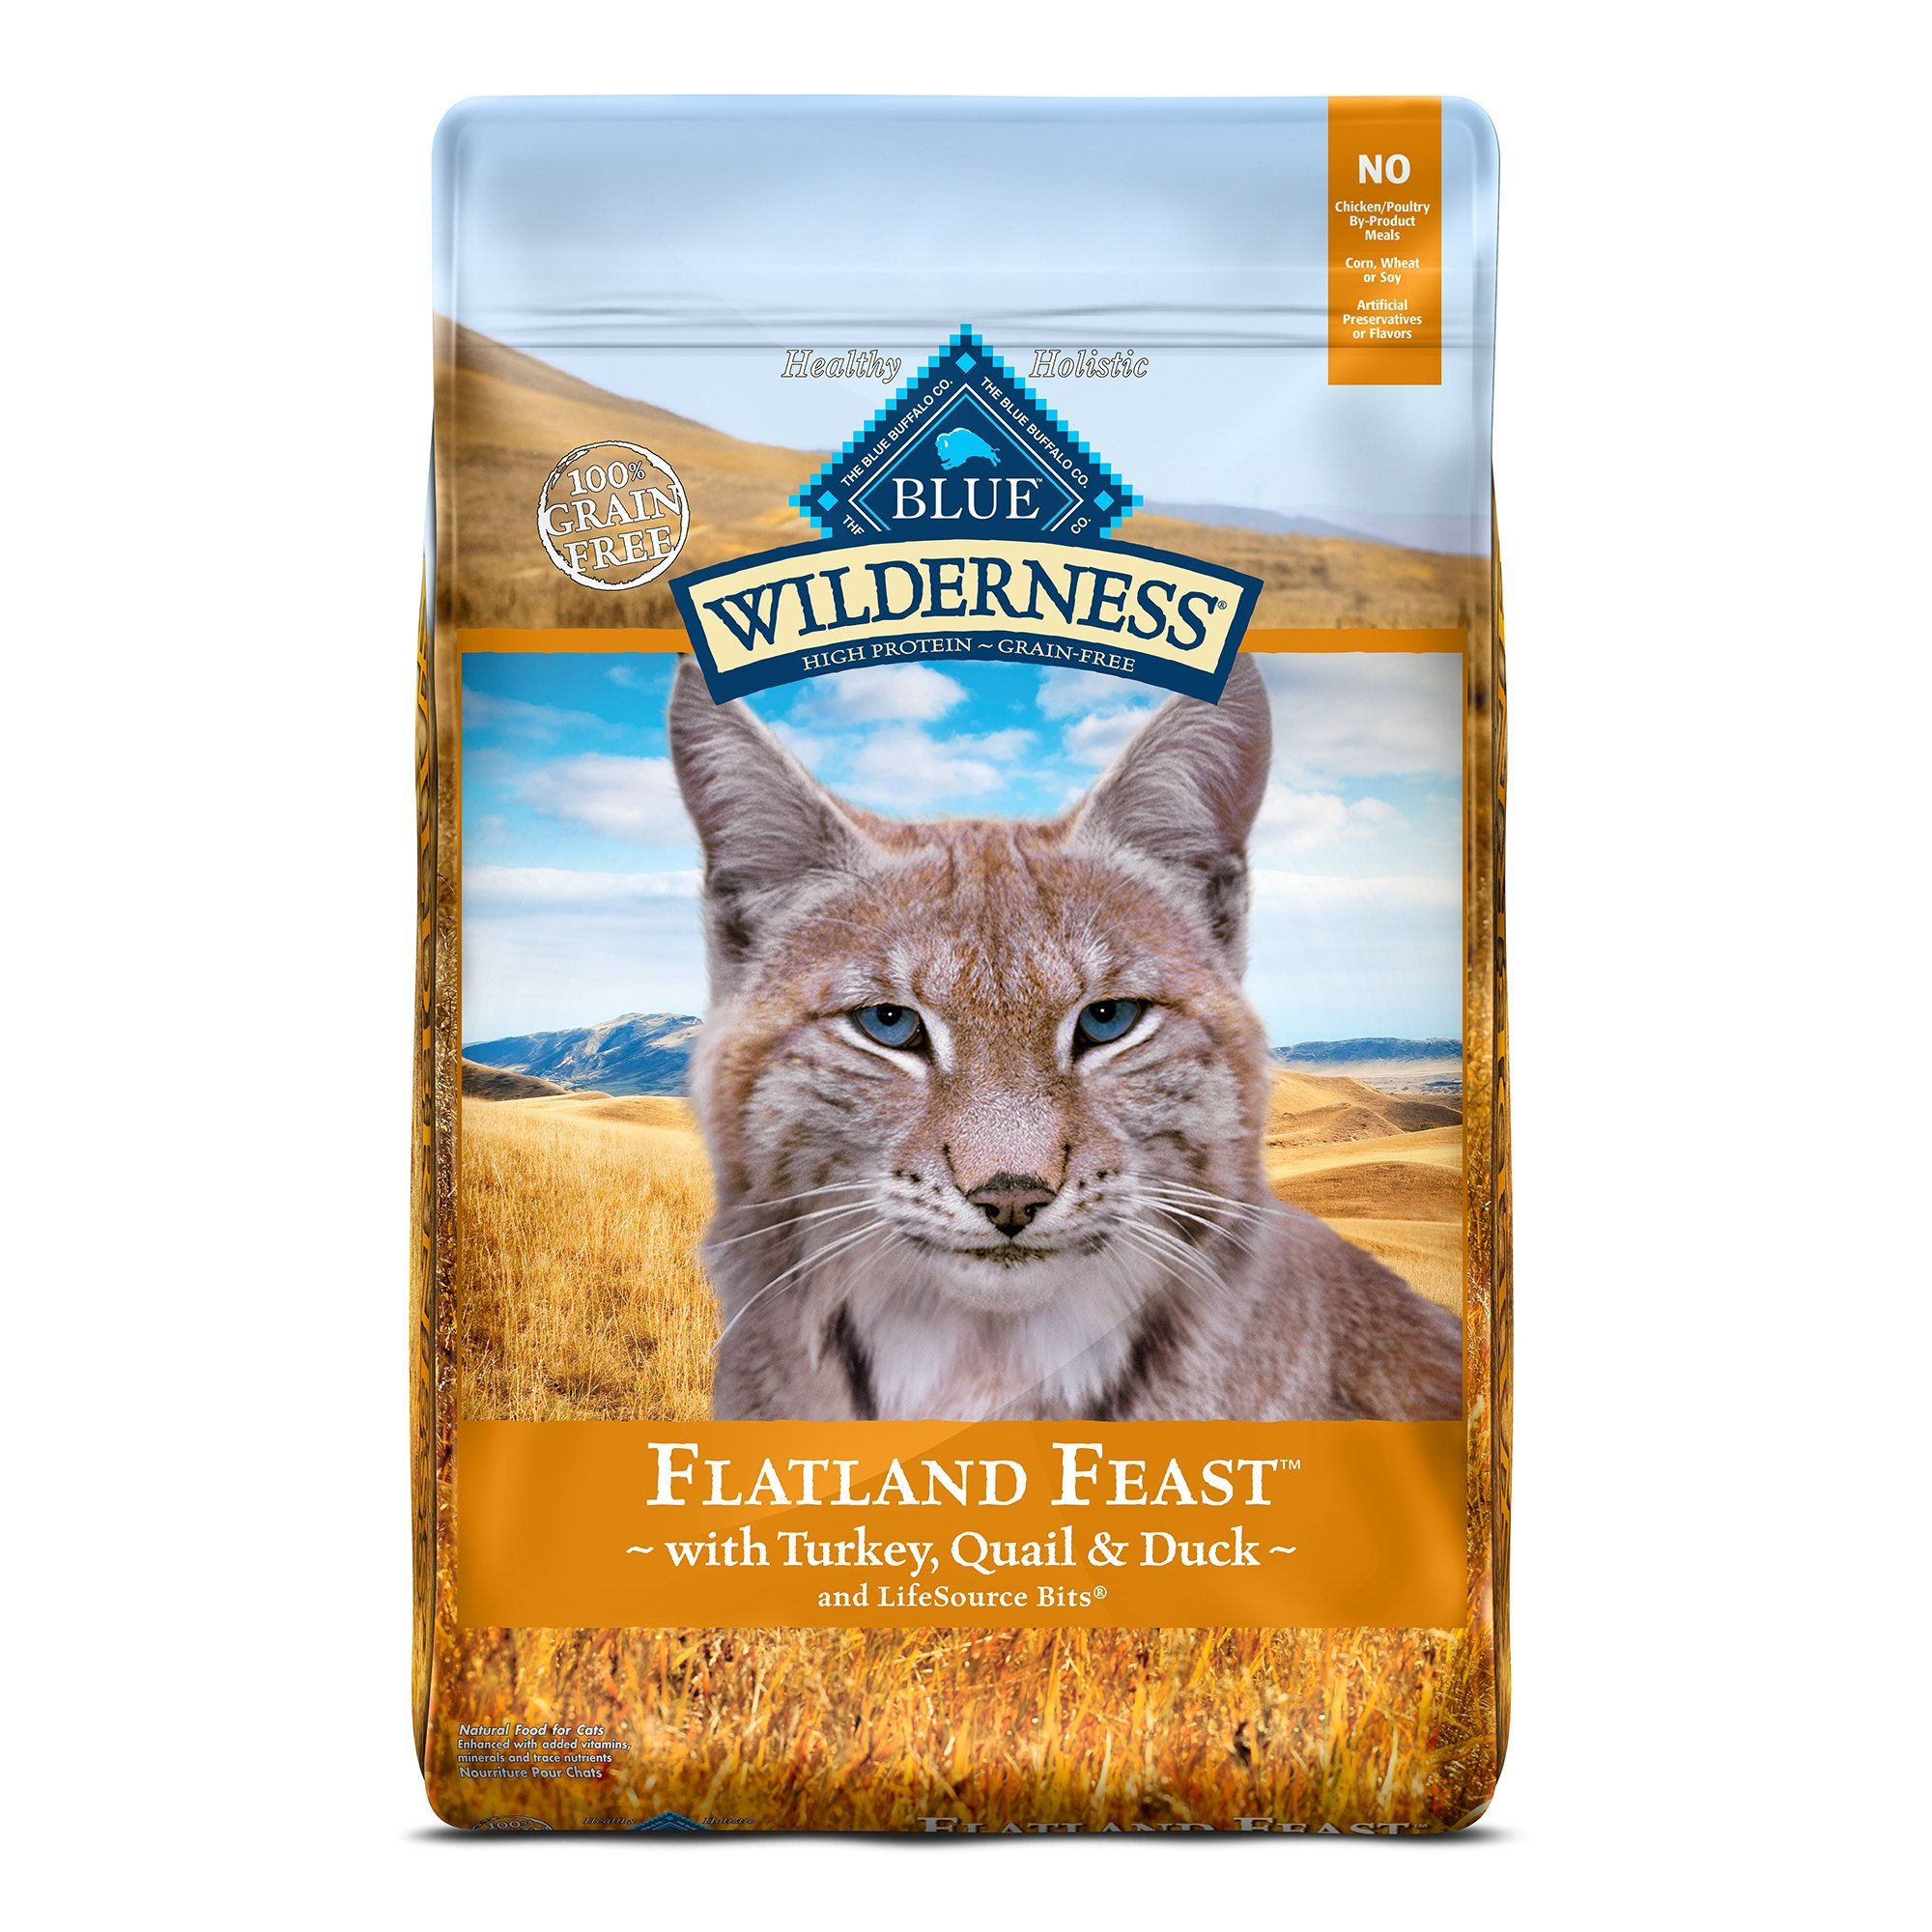 Blue Buffalo Blue Wilderness Regionals Flatland Feast Dry Cat Food 10 Lbs Petco In 2020 Dry Cat Food Cat Food Blue Buffalo